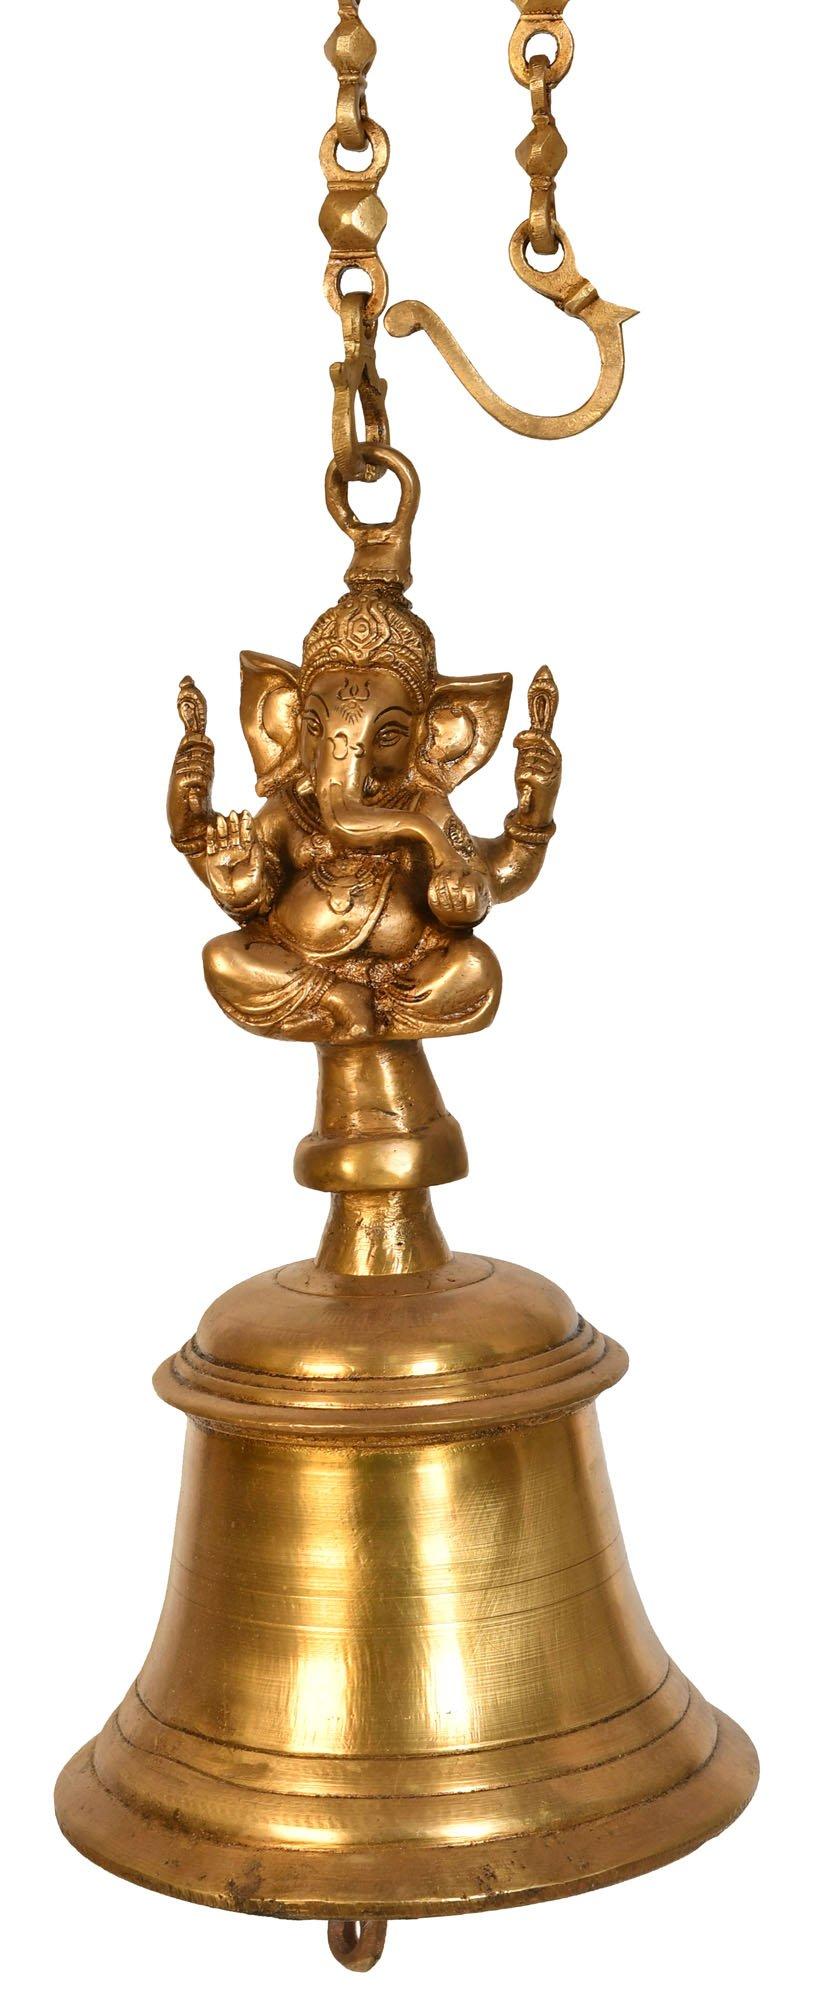 Large Size Ganesha Temple Hanging Bell